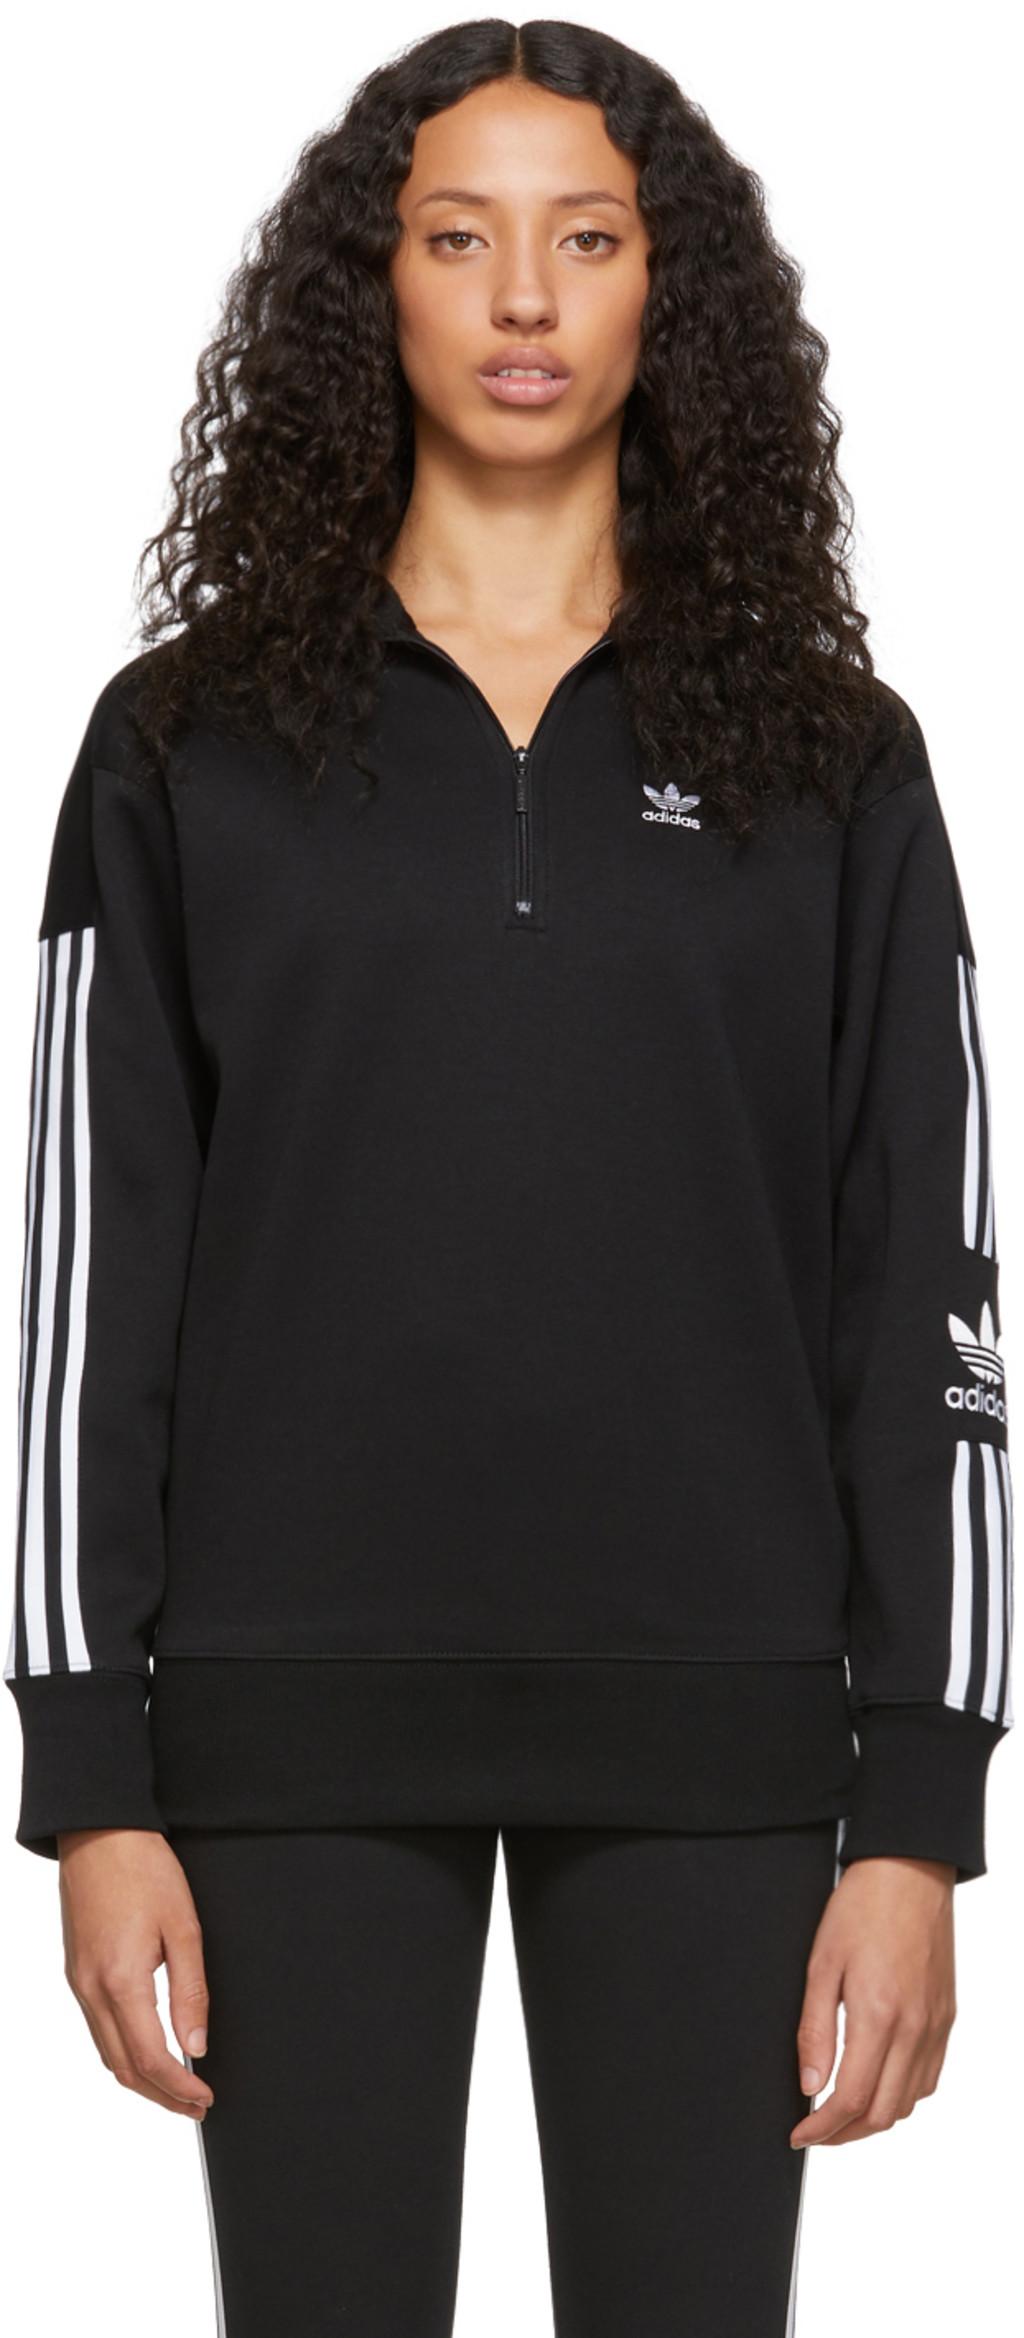 4f4a8d0d79 Black Half-Zip Sweater